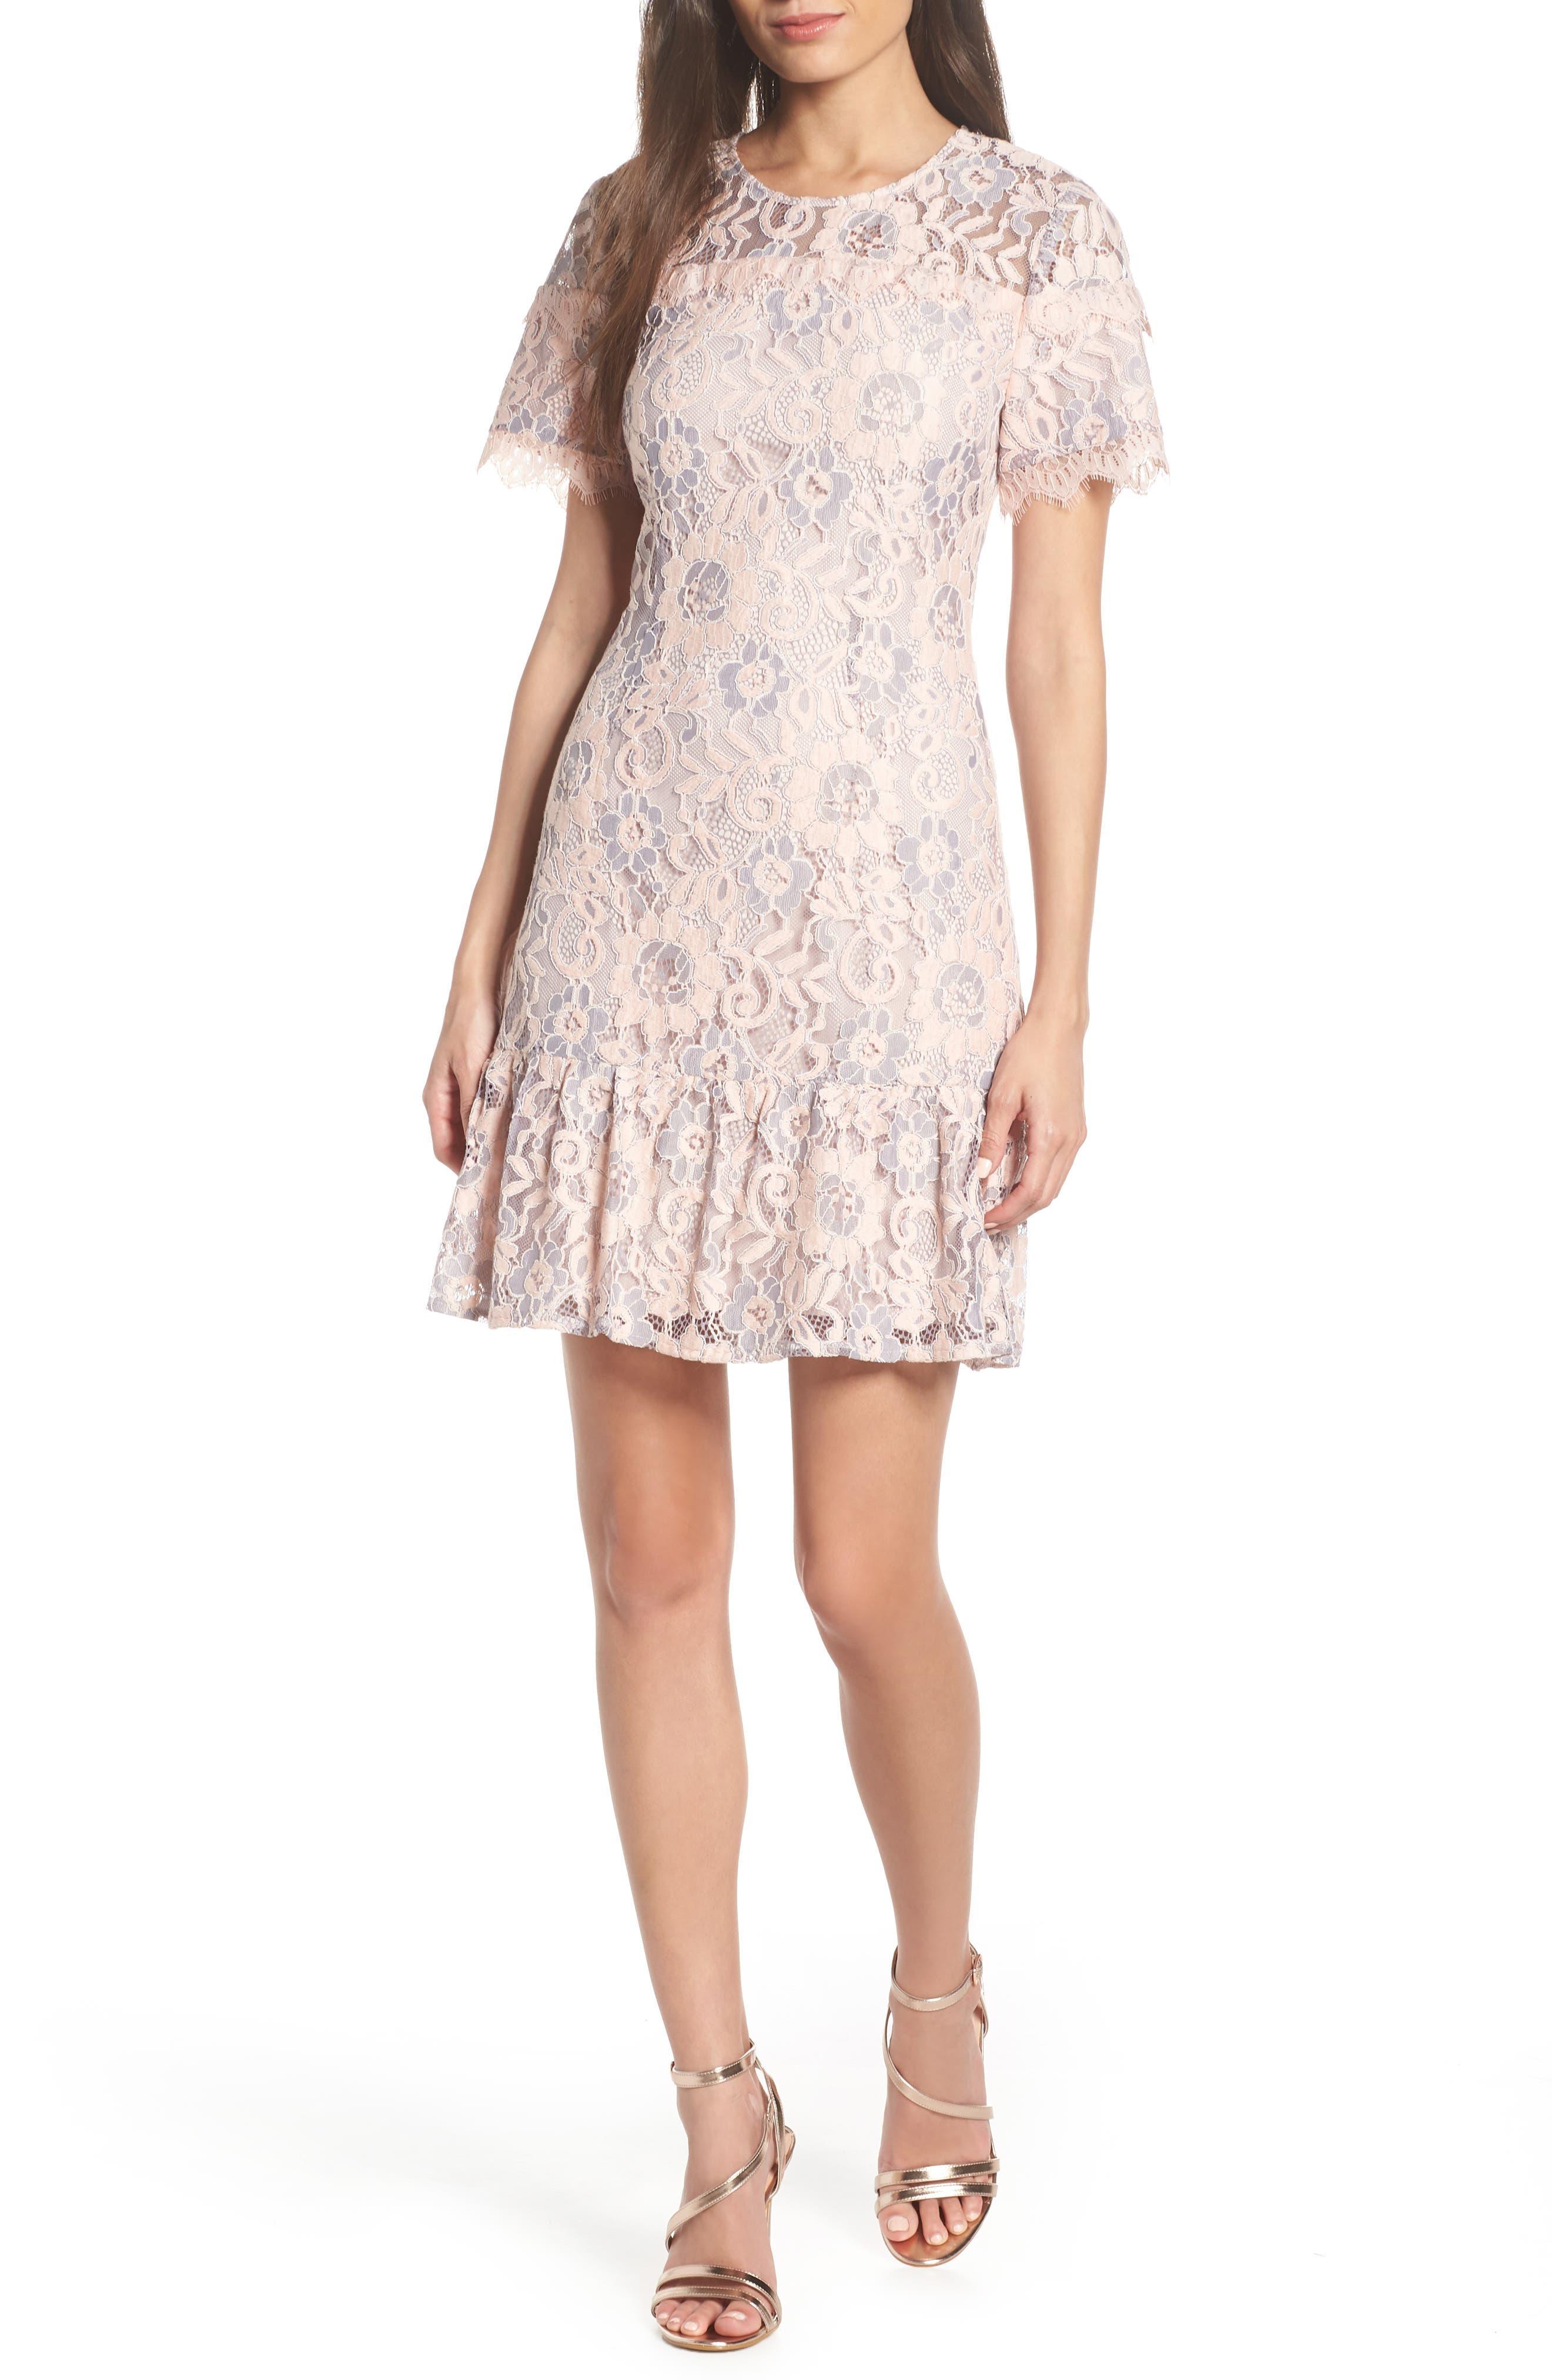 CHARLES HENRY Lace Ruffle Hem Minidress, Main, color, BLUSH LACE